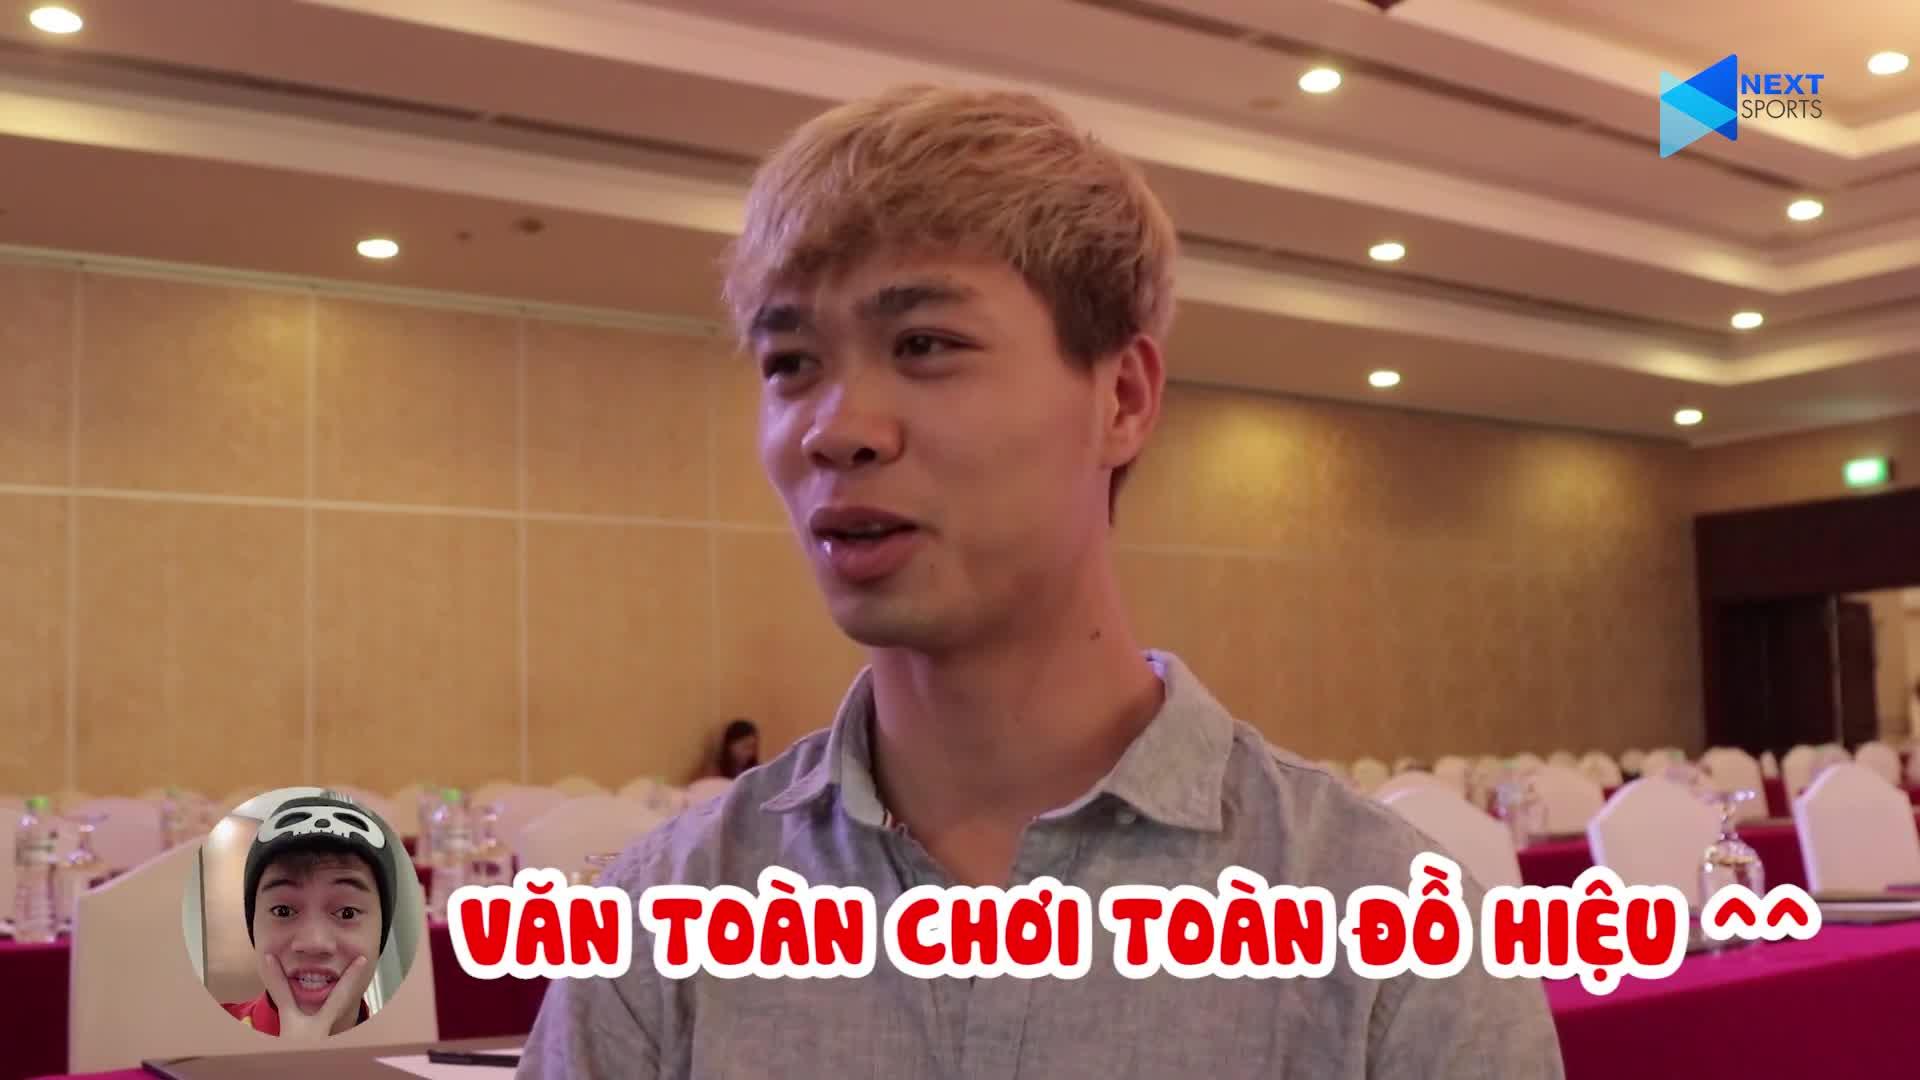 nhung cau tra loi lay loi cua cong phuong ve dong doi van toan